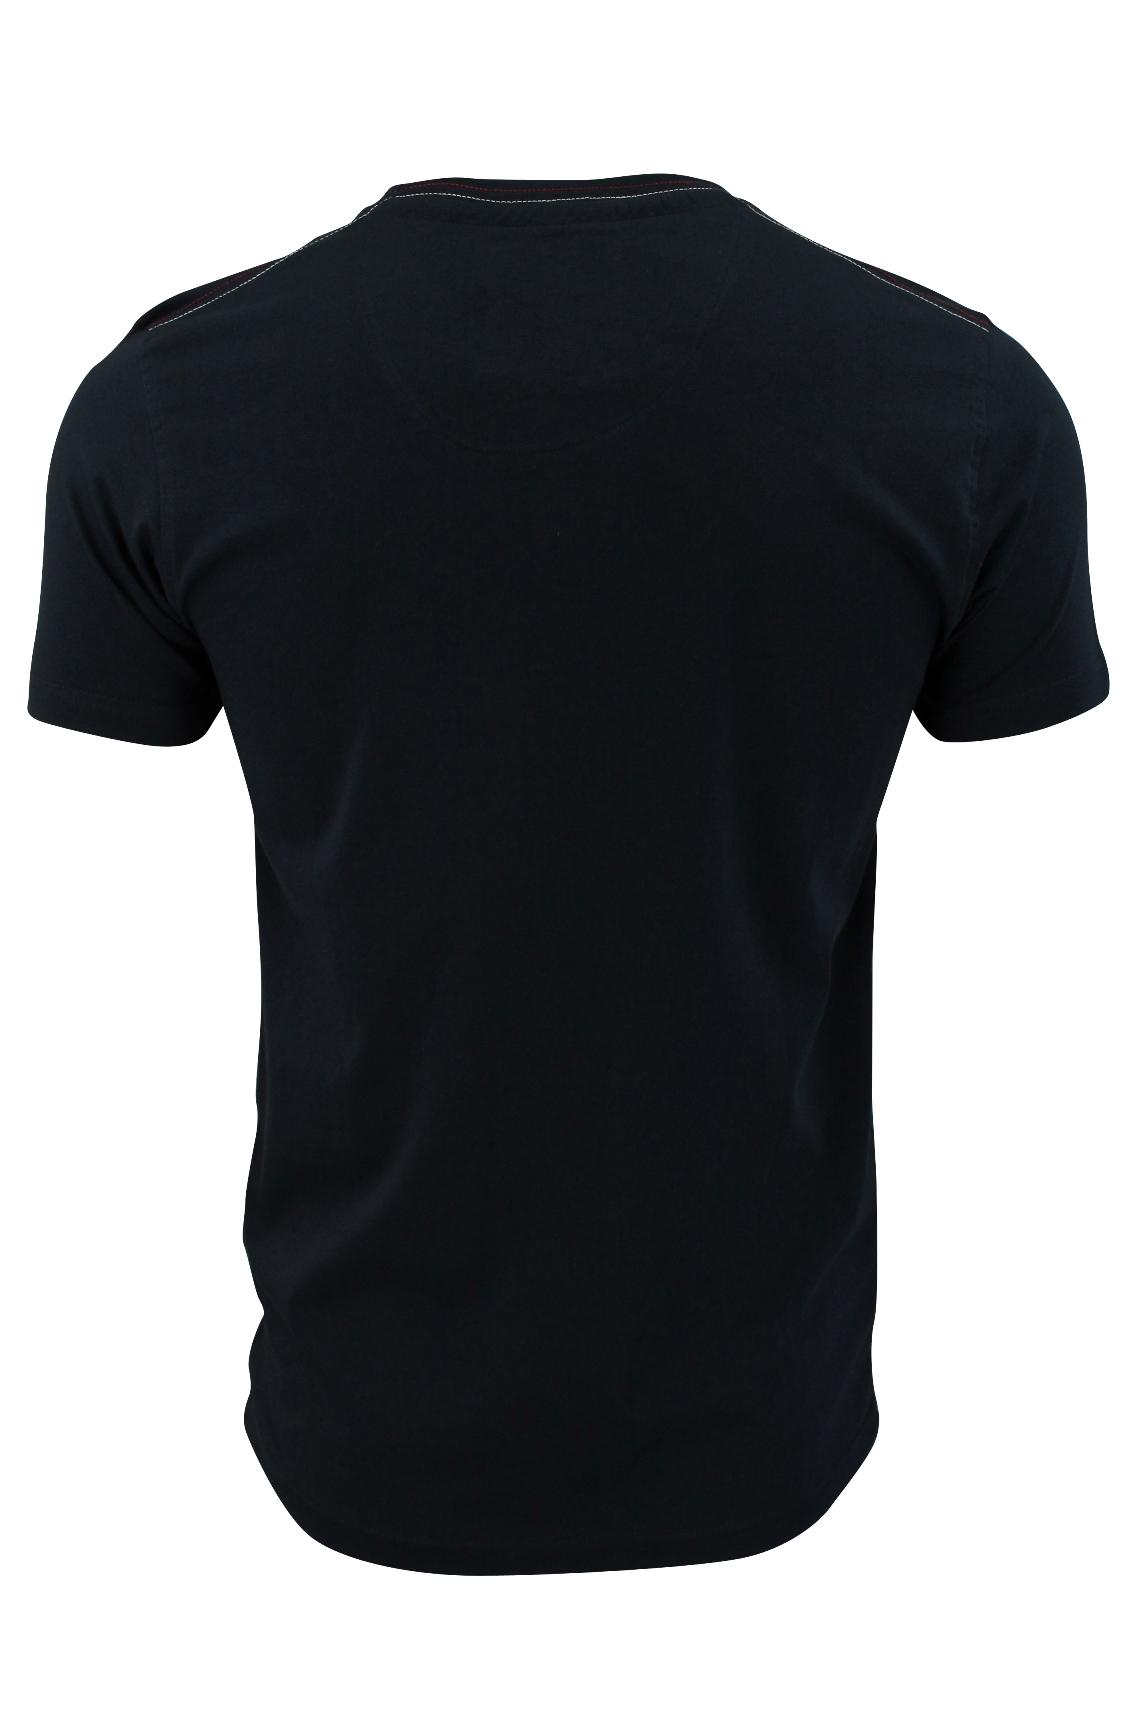 Mens T-Shirt by Santa Monica 'Salvador' Short Sleeved